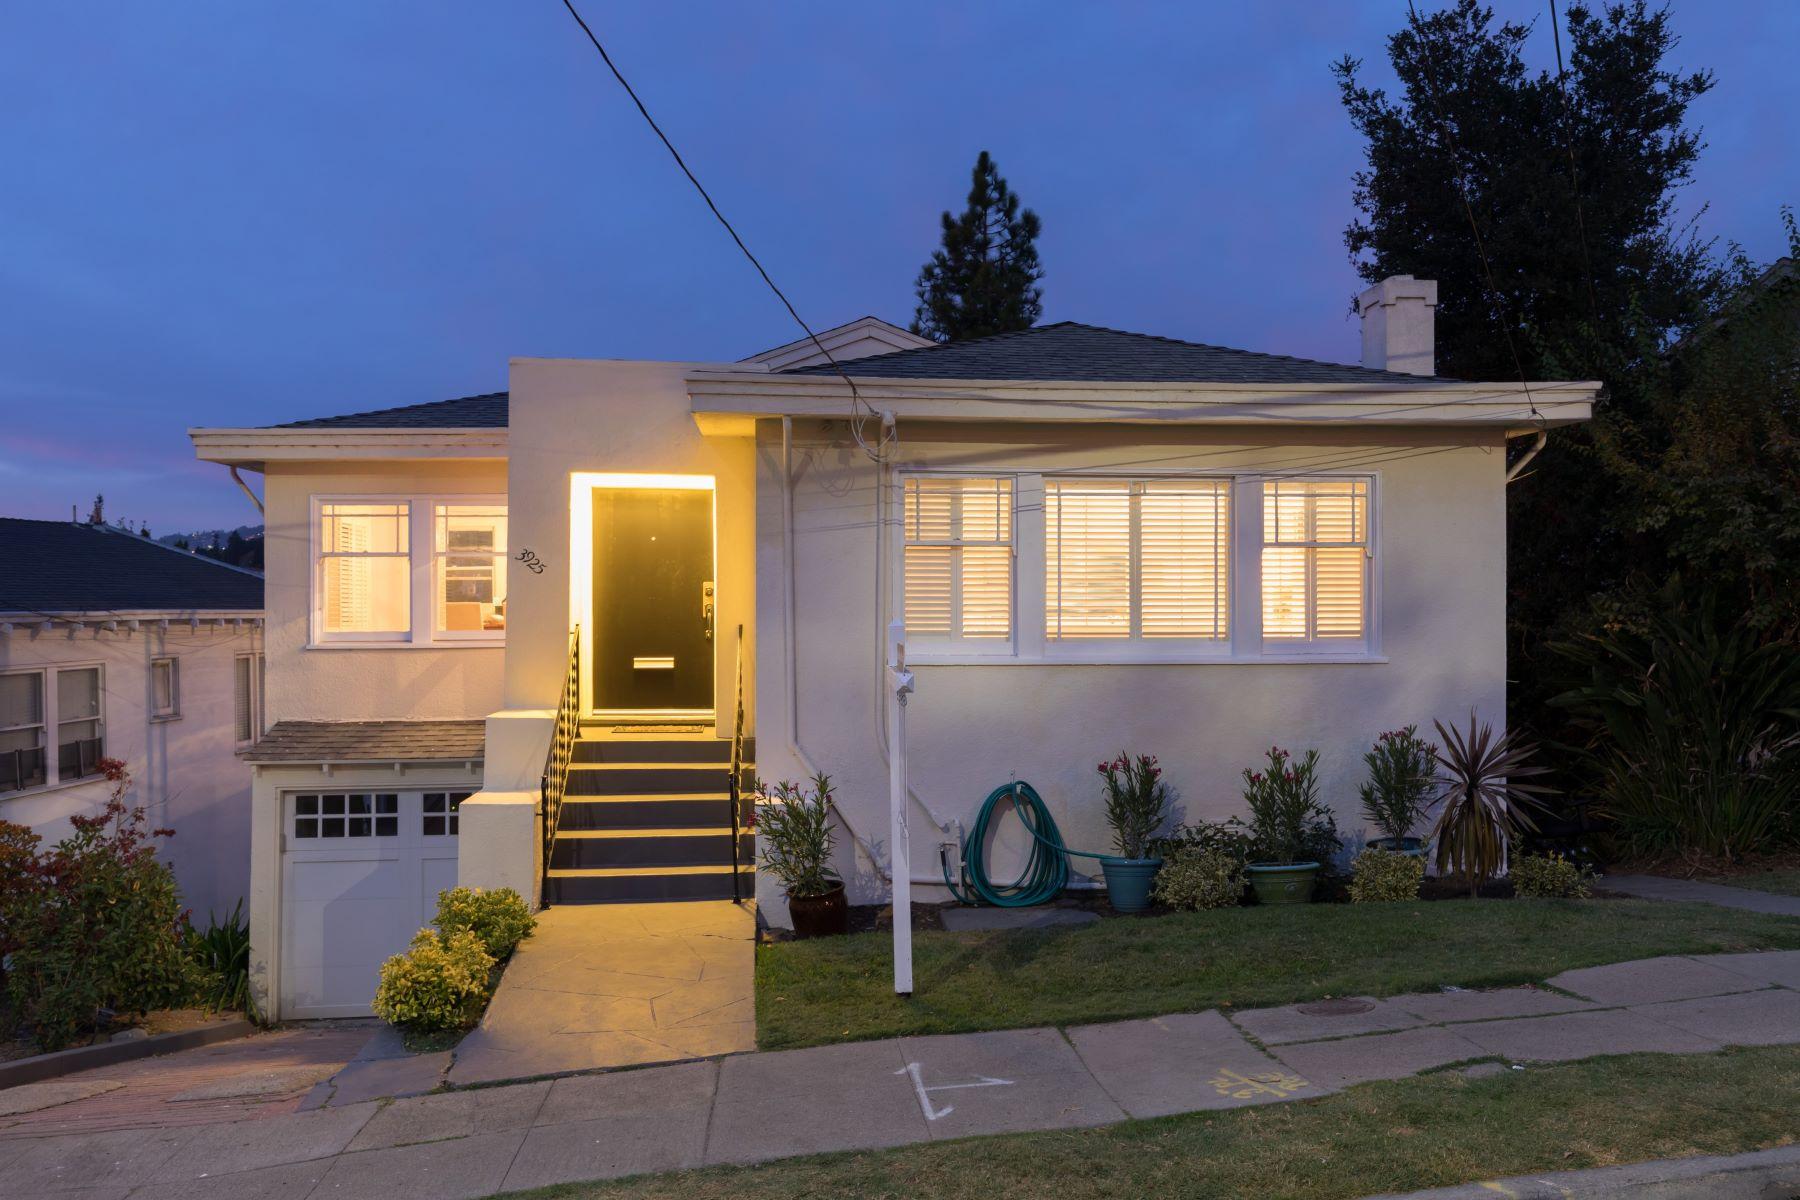 Single Family Homes for Sale at Crocker Highlands Craftsman 3925 Balfour Avenue Oakland, California 94610 United States